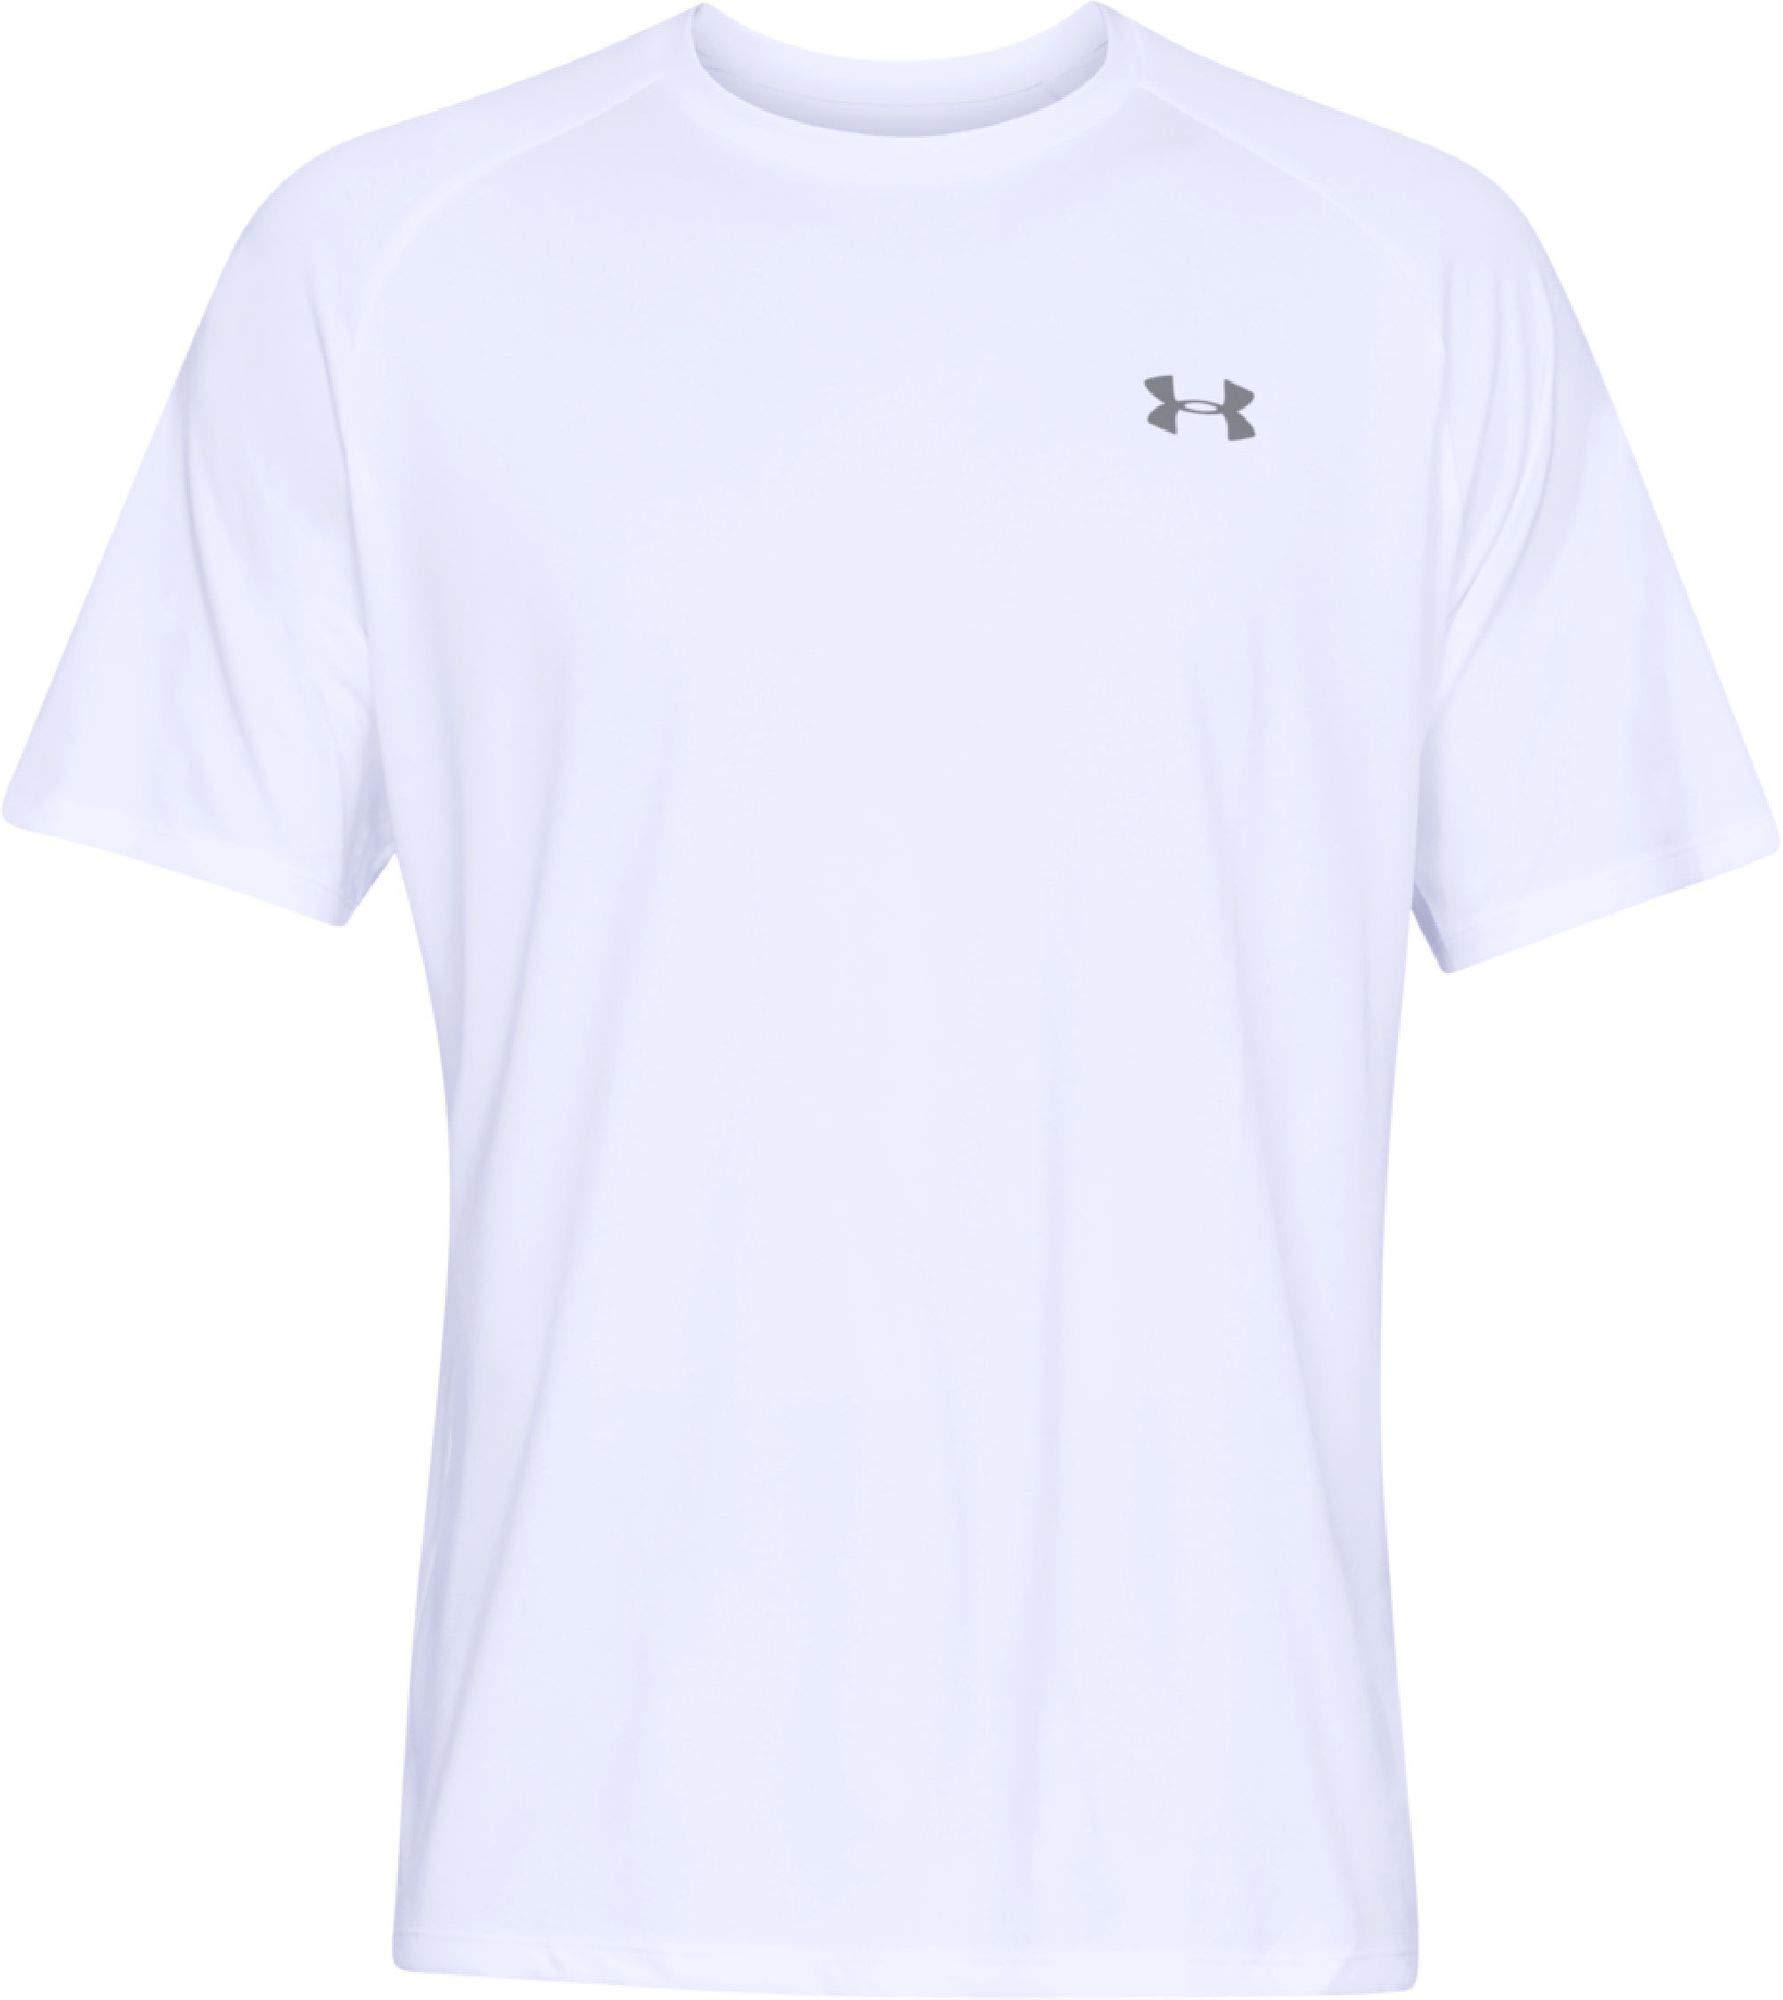 Under Armour Men's UA Tech Short Sleeve Tee 2.0, White, XS-R